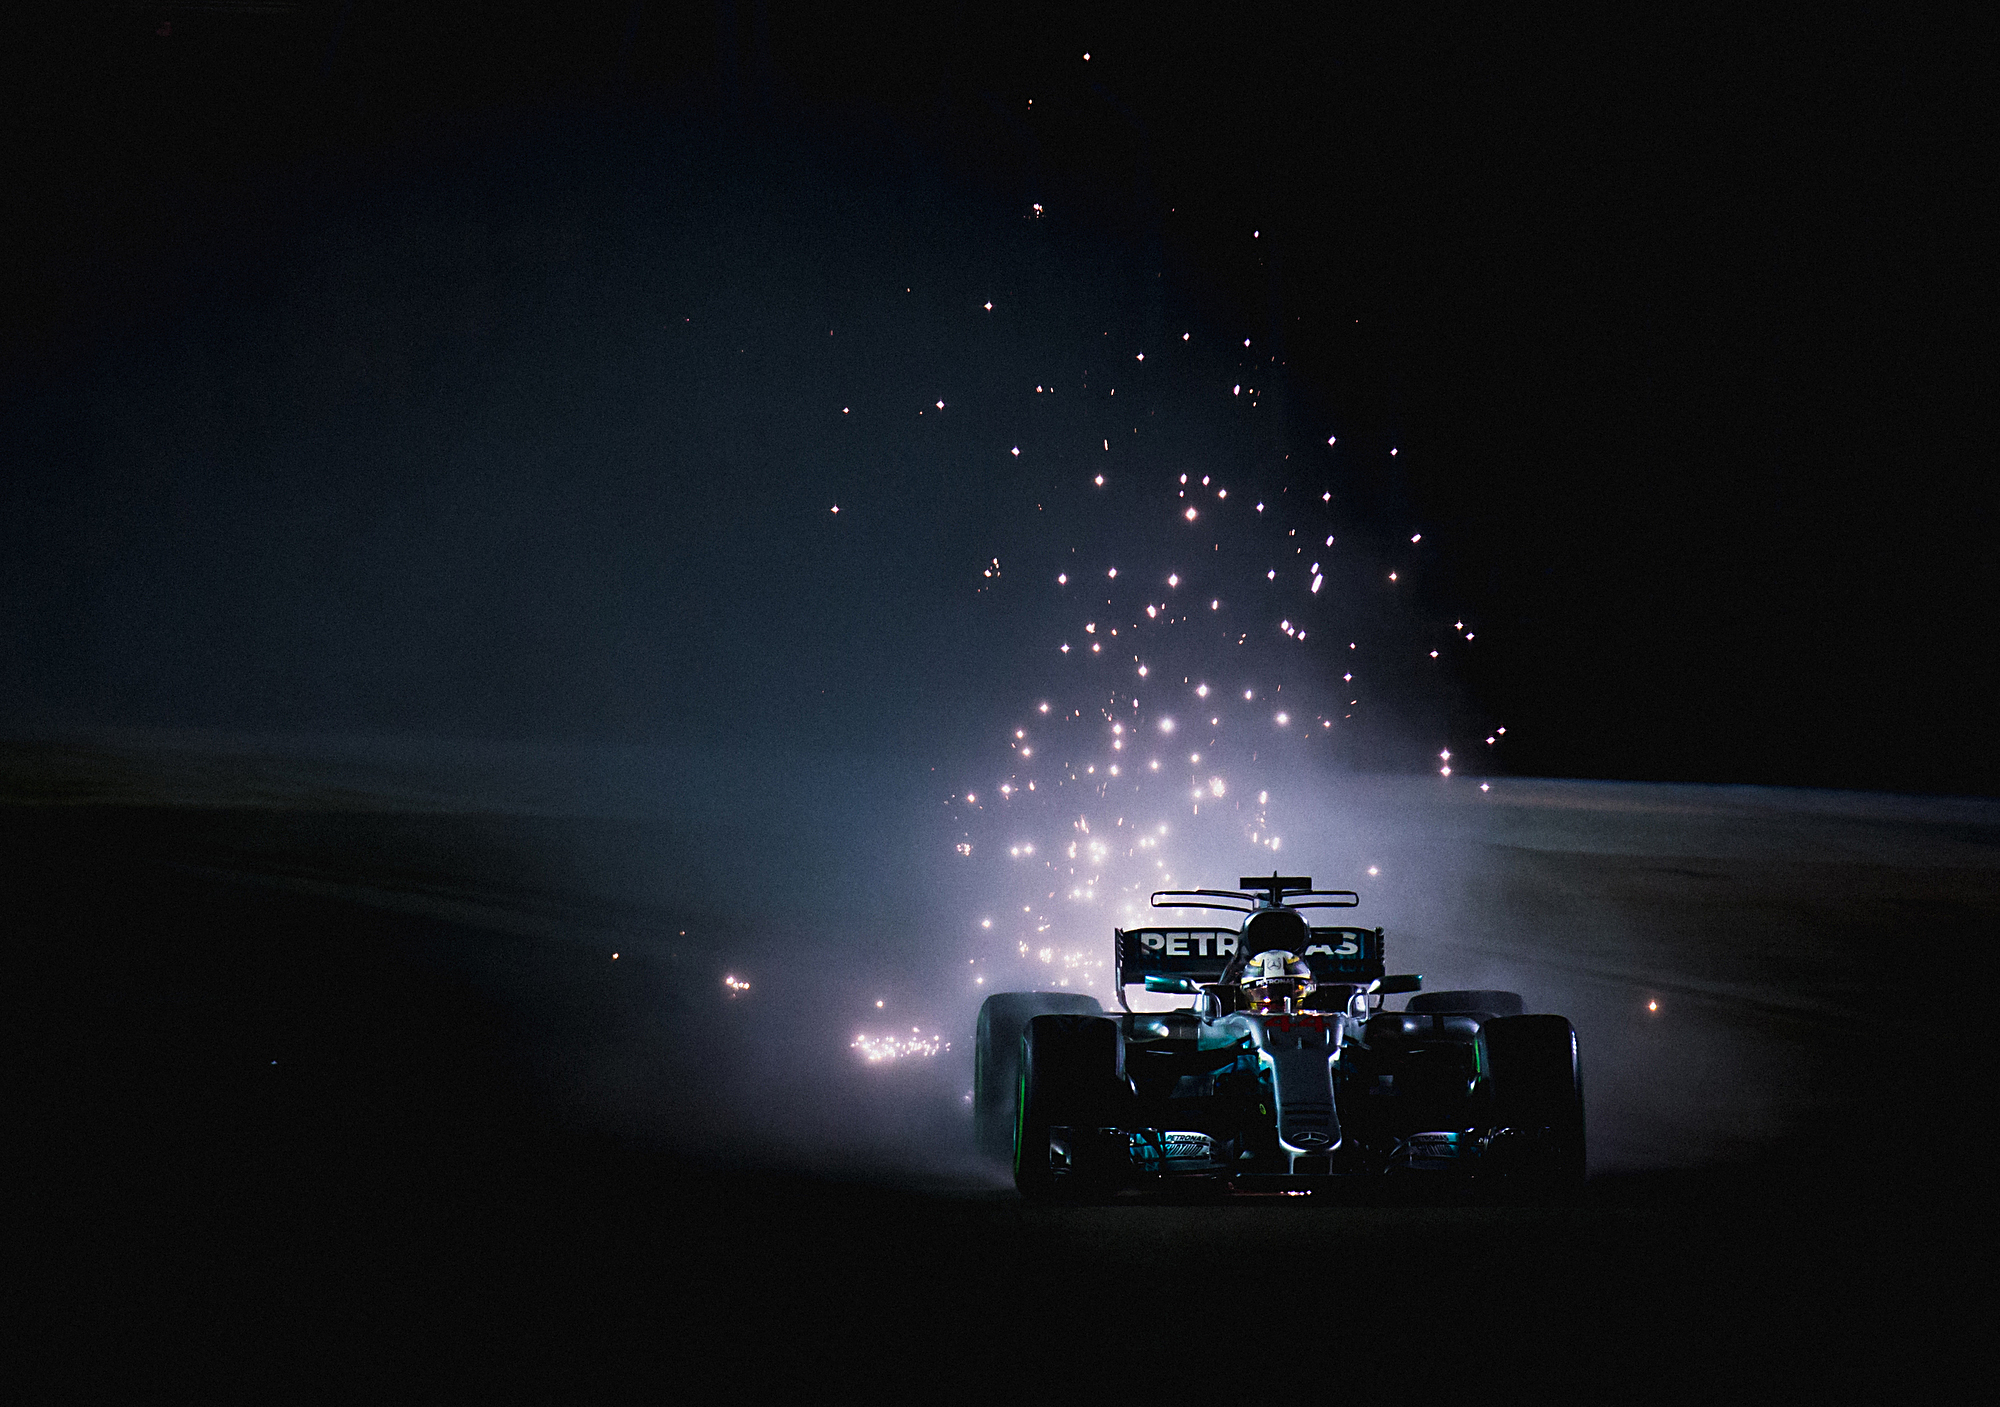 Lewis Hamilton, Mercedes. 2017 FIA Formula 1 Championship, Marina Bay, Singapore.